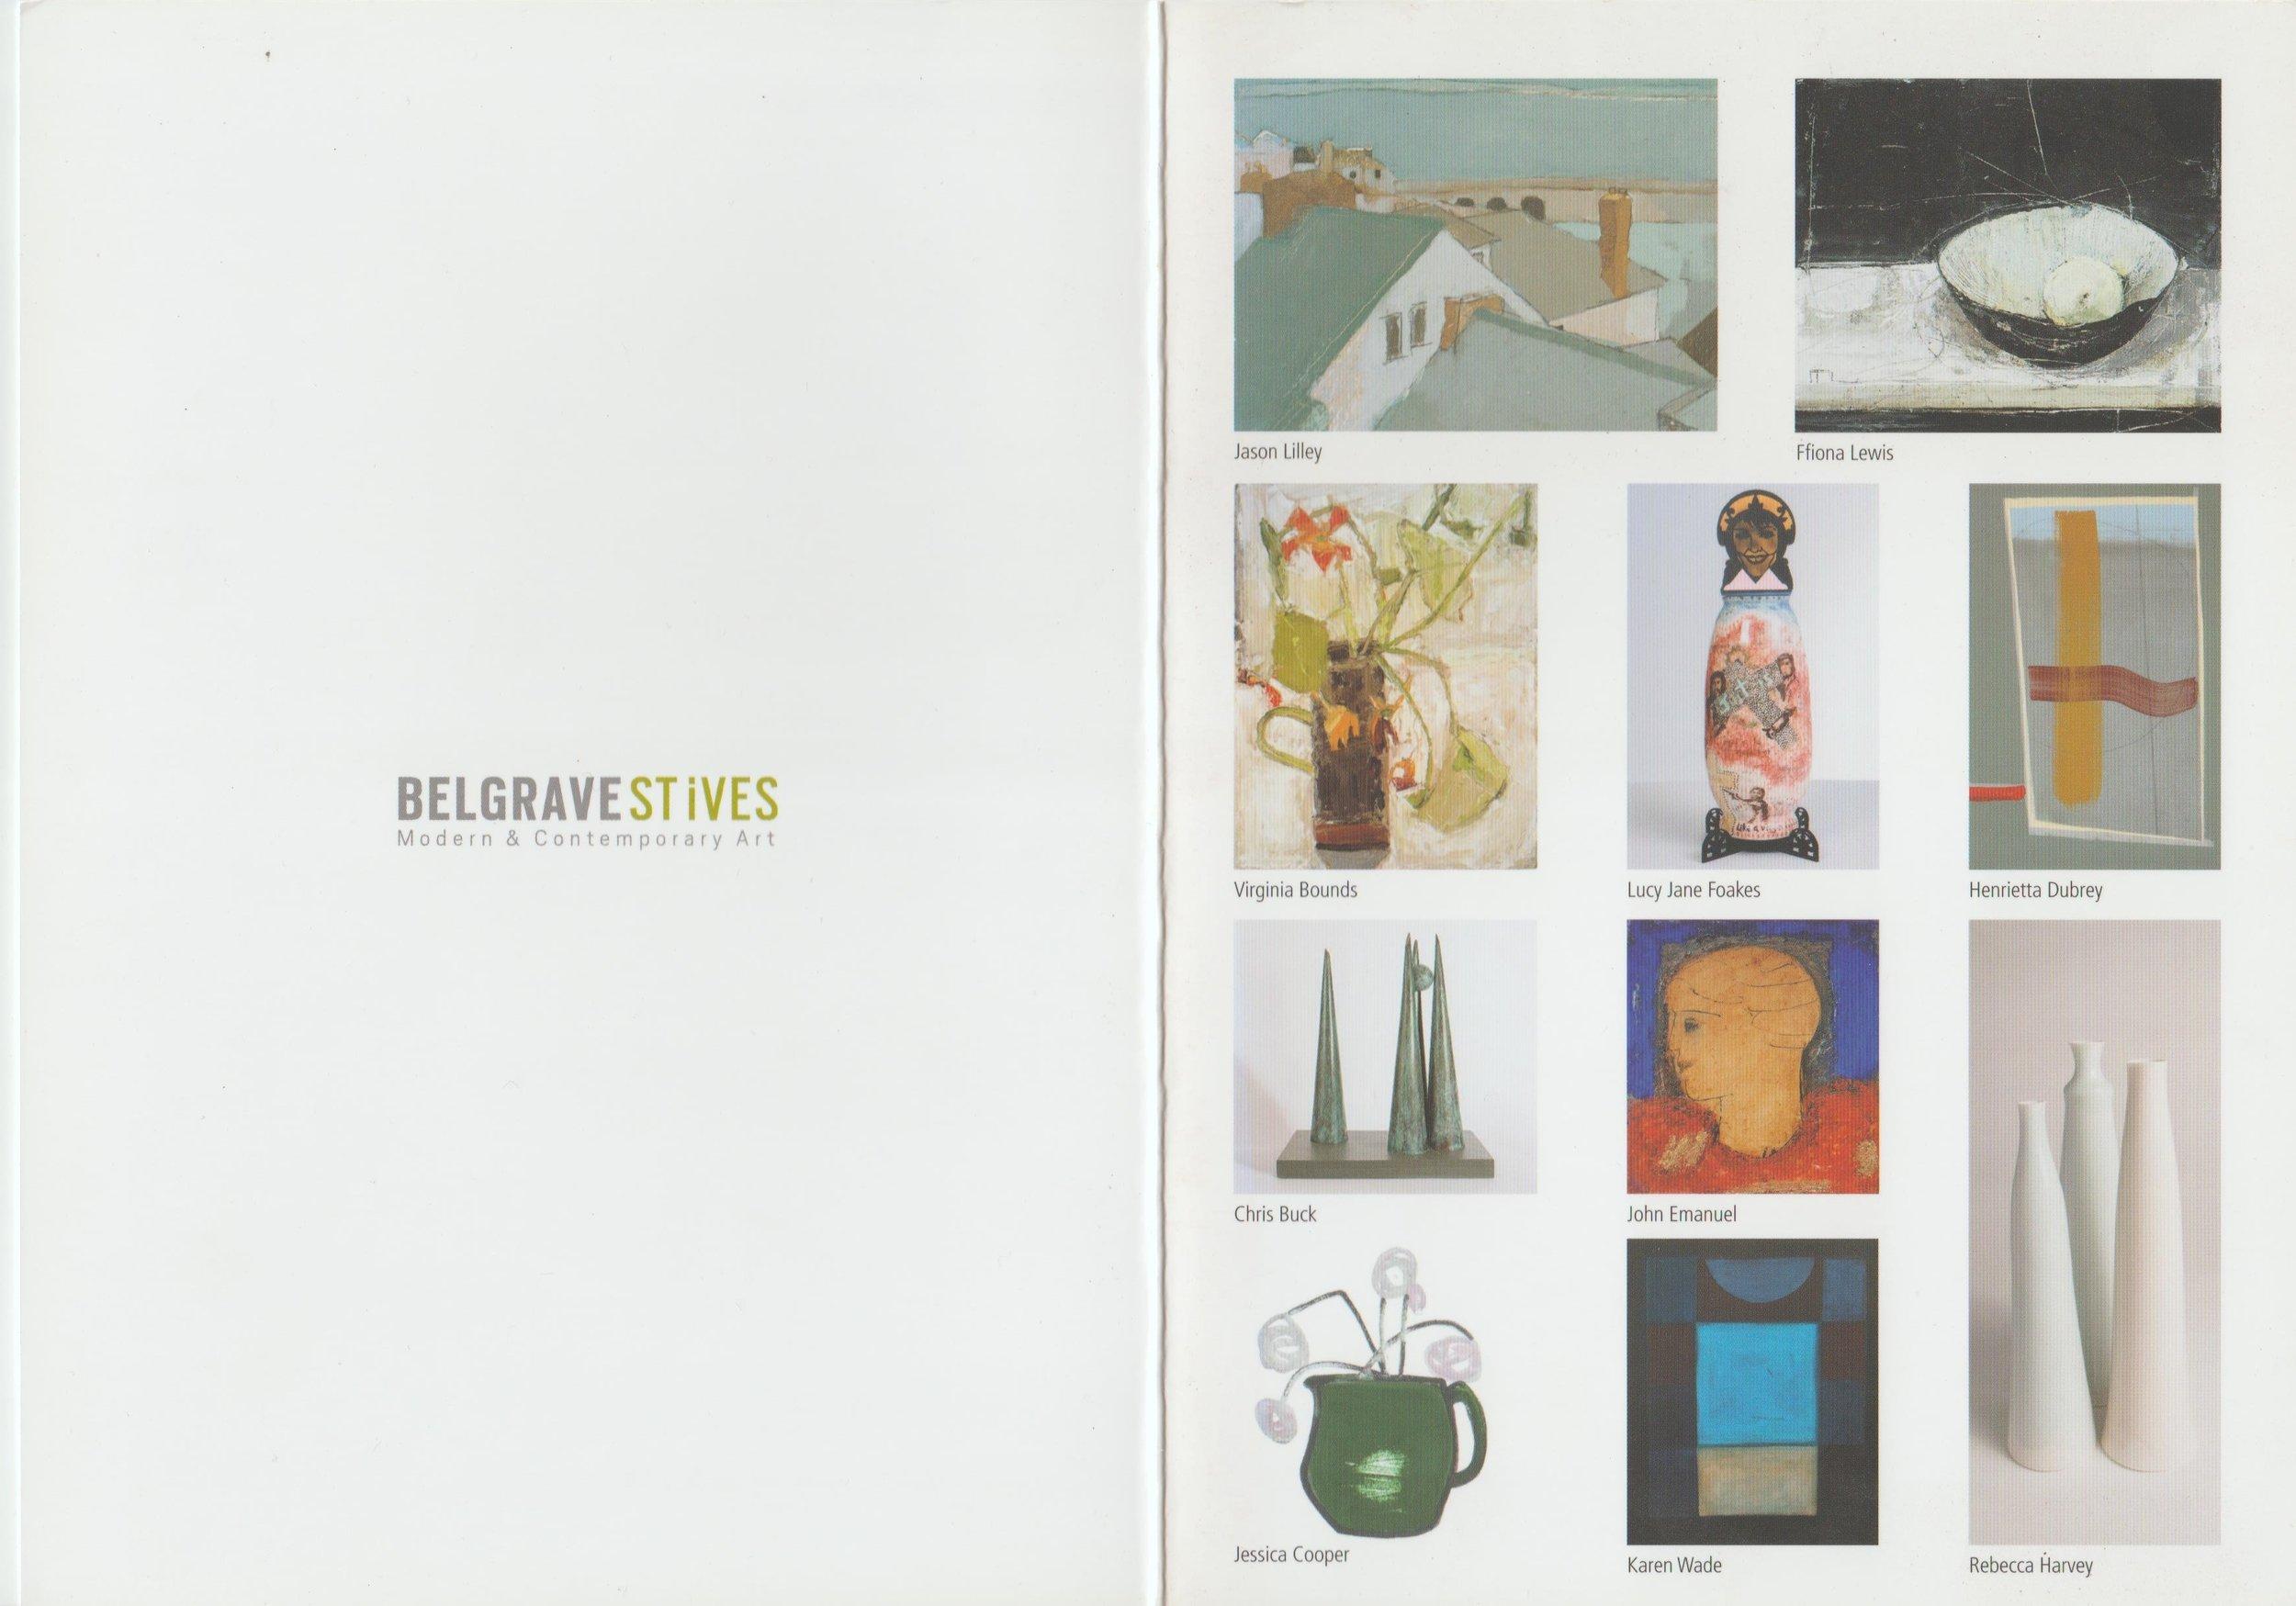 Belgrave St Ives, 2011